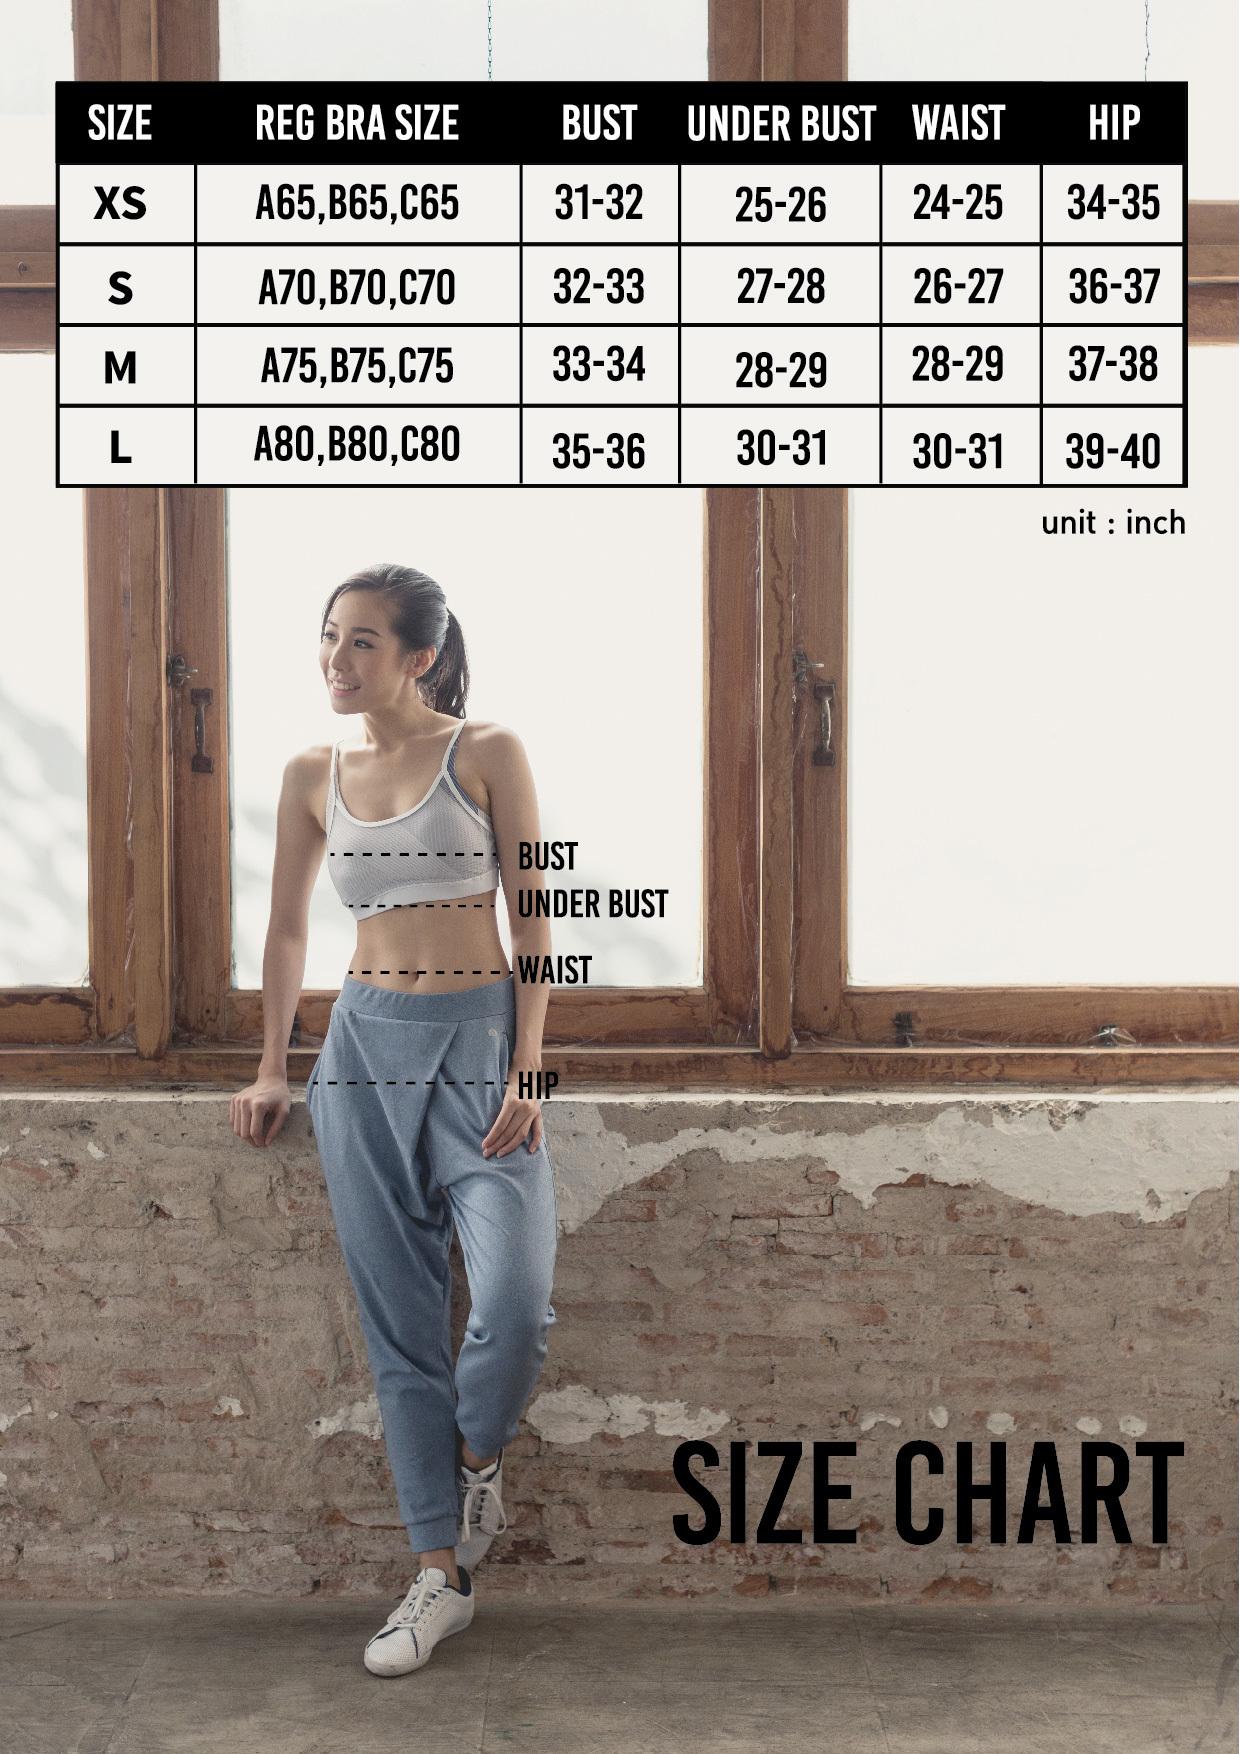 Wakingbee Activewear Size Chart